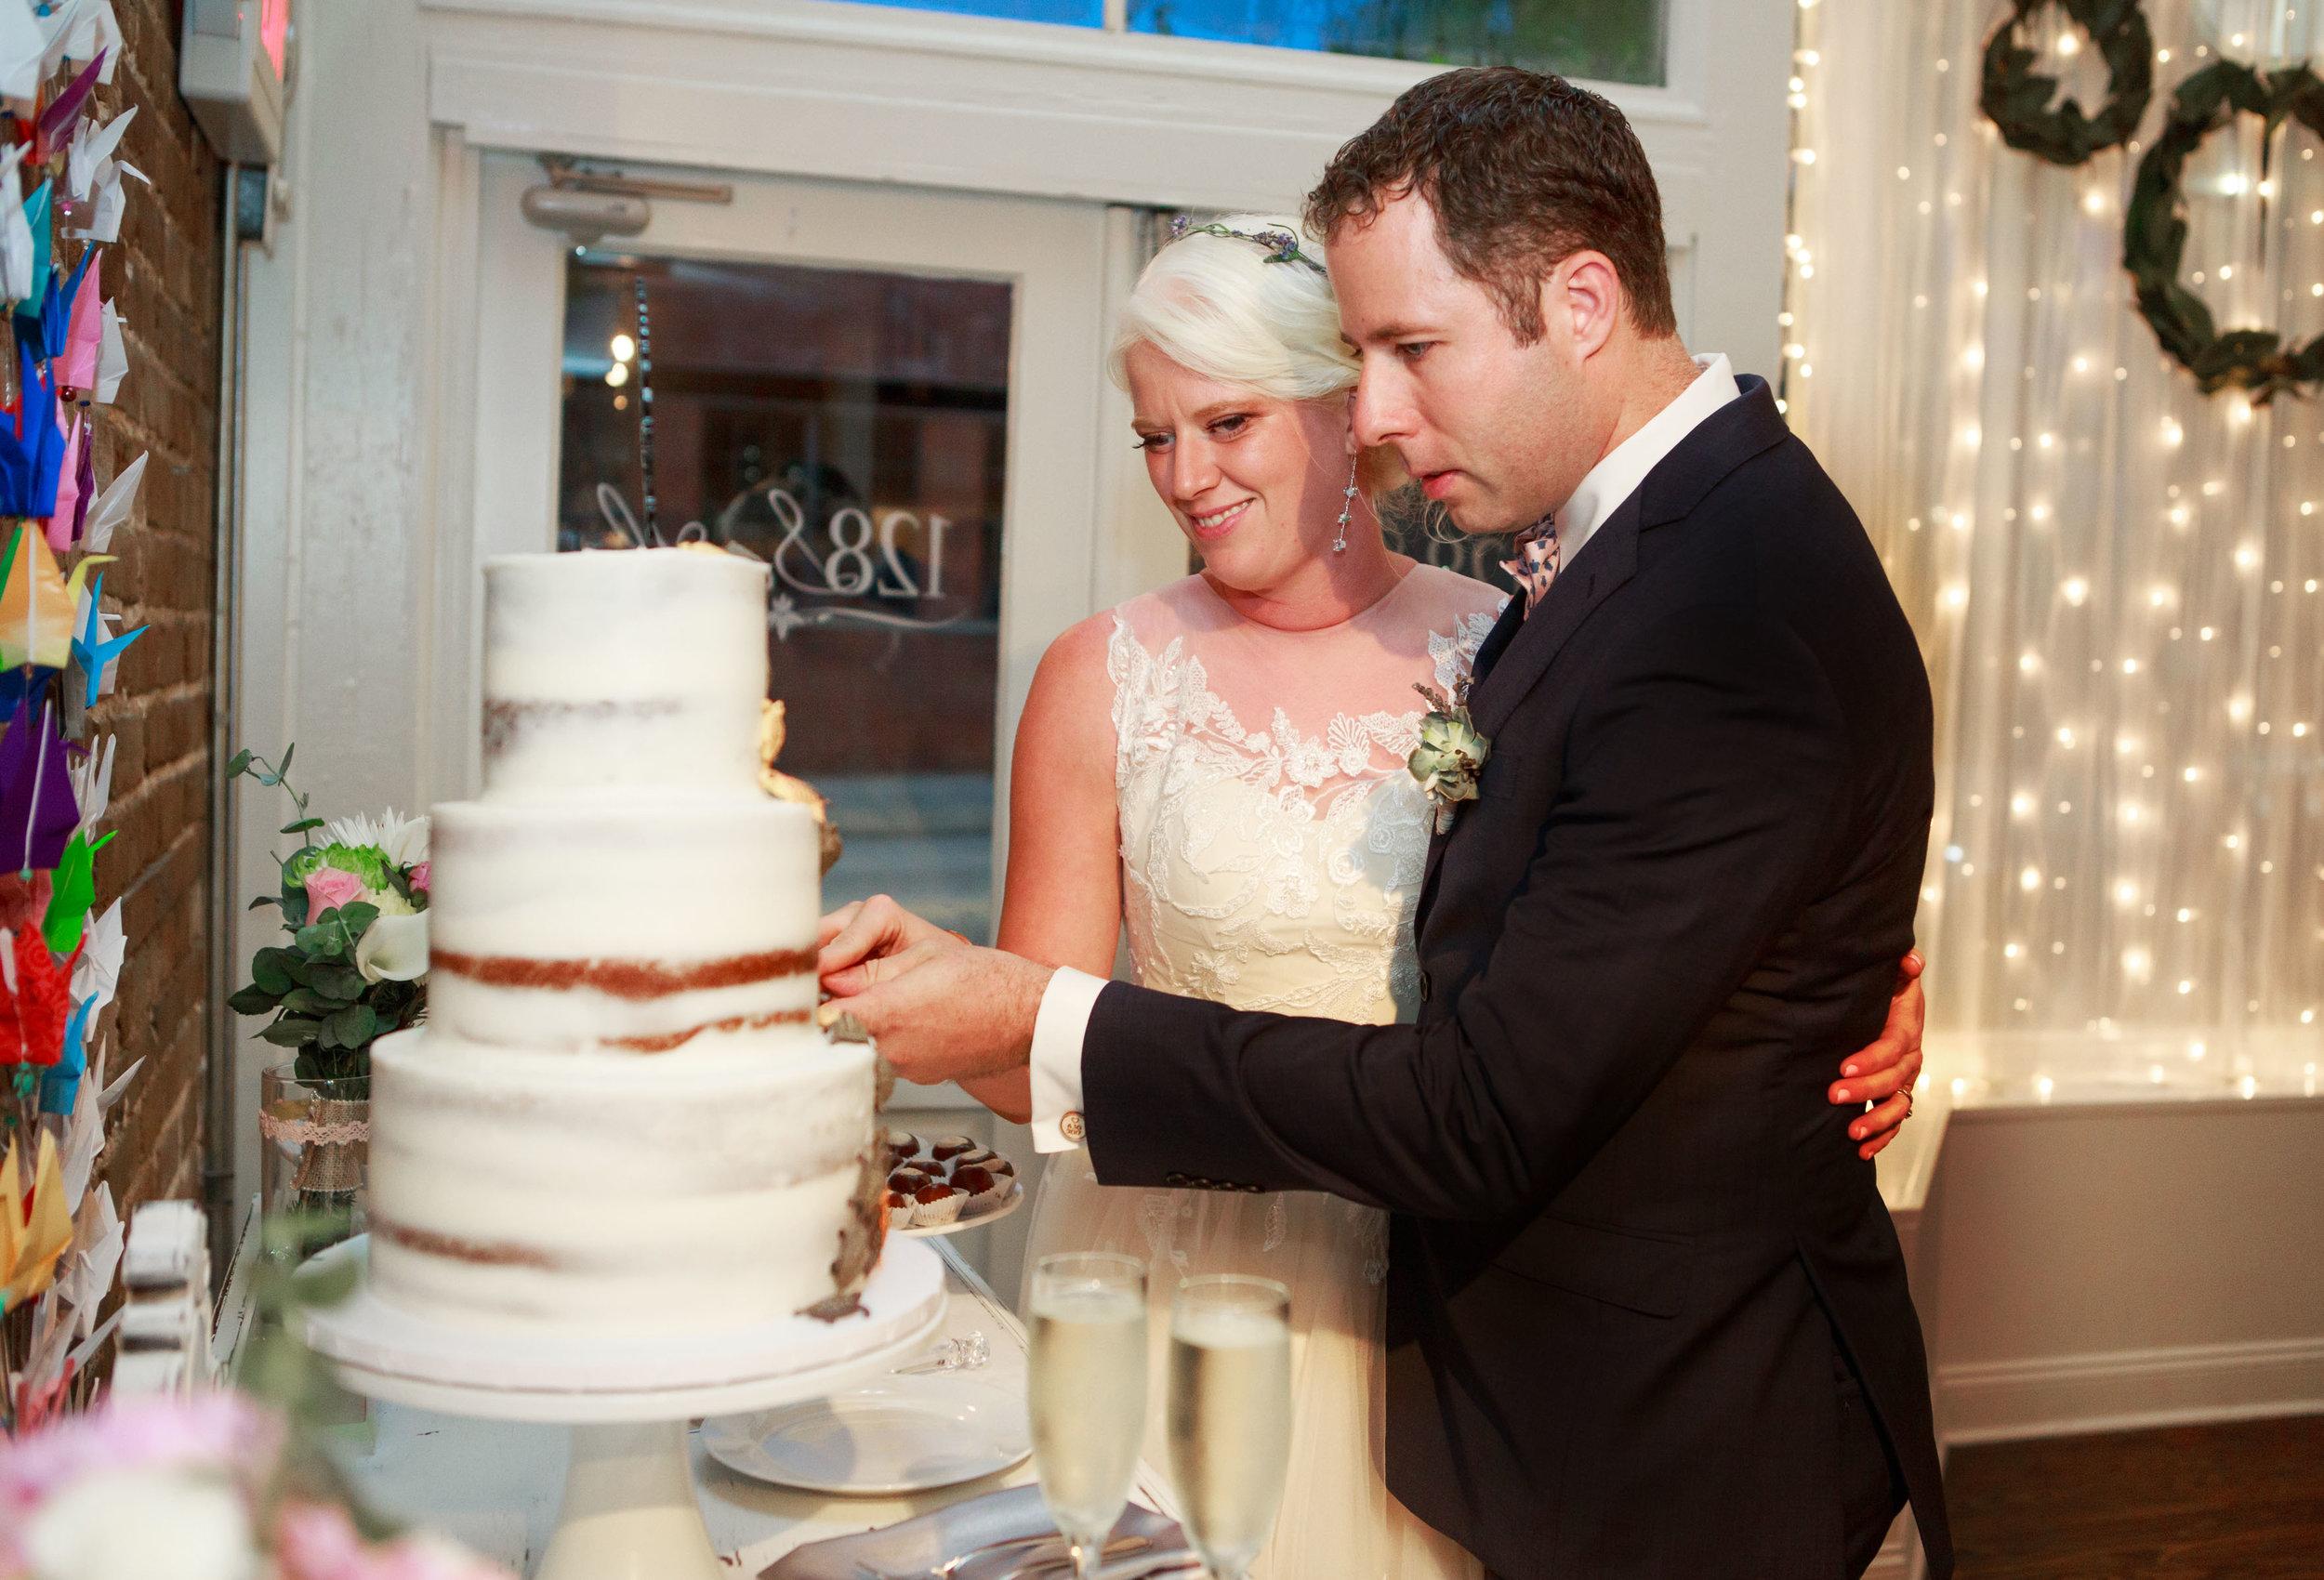 128-South-Wedding-Wilmington-NC-Photographer-Reception-81.jpg